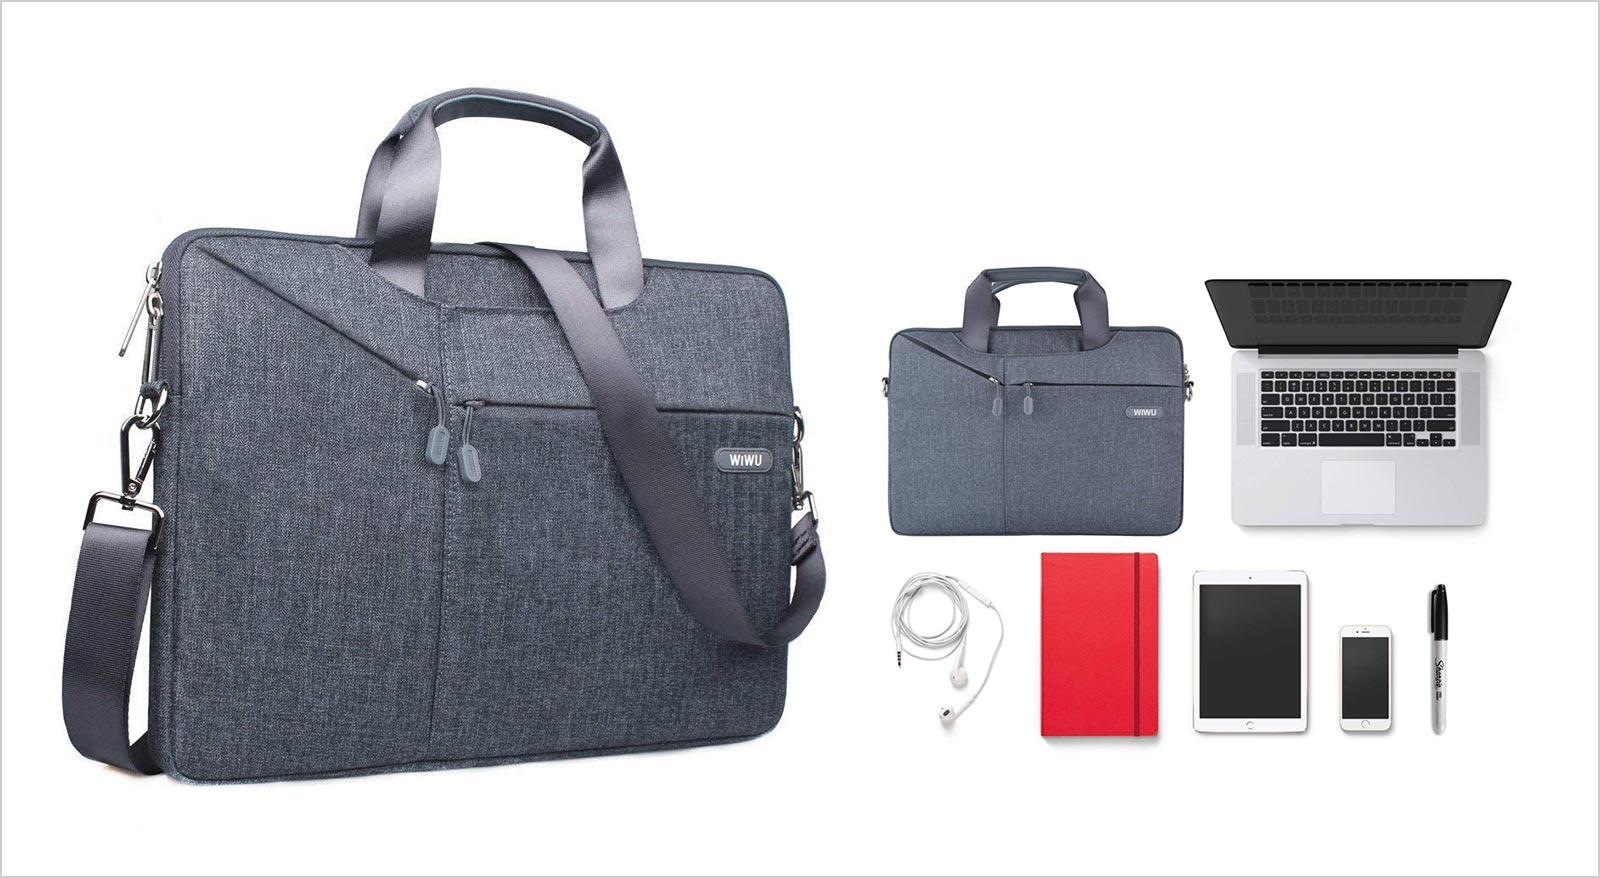 13 13.3 Inch-Laptop-Bag-Waterproof-Shoulder-Bag-Macbook-Air-12-9-Inch-iPad-Pro